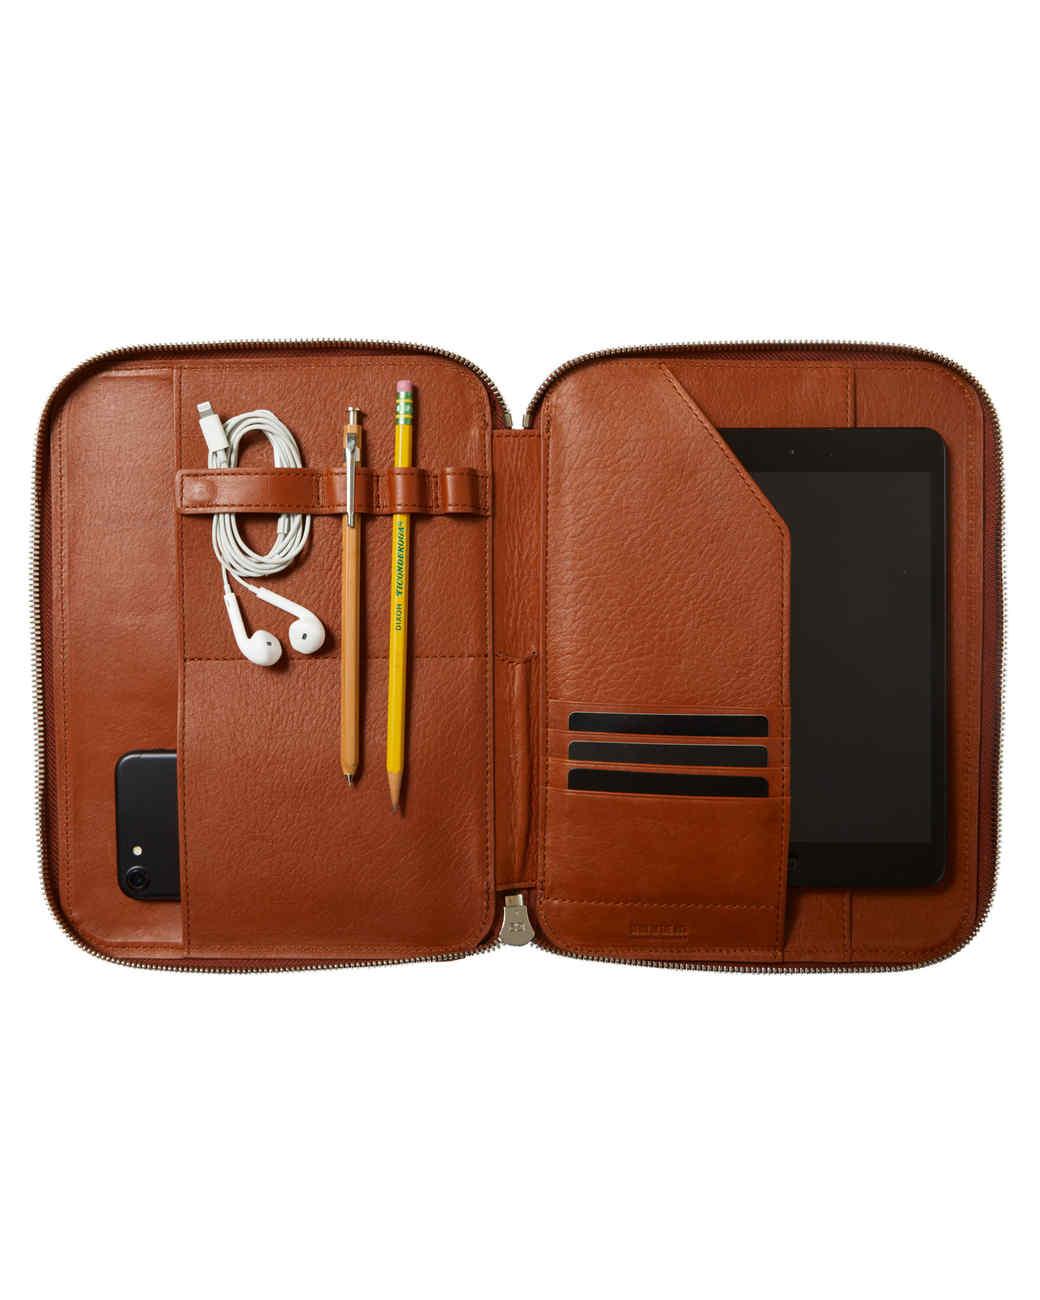 Shinola leather portfolio